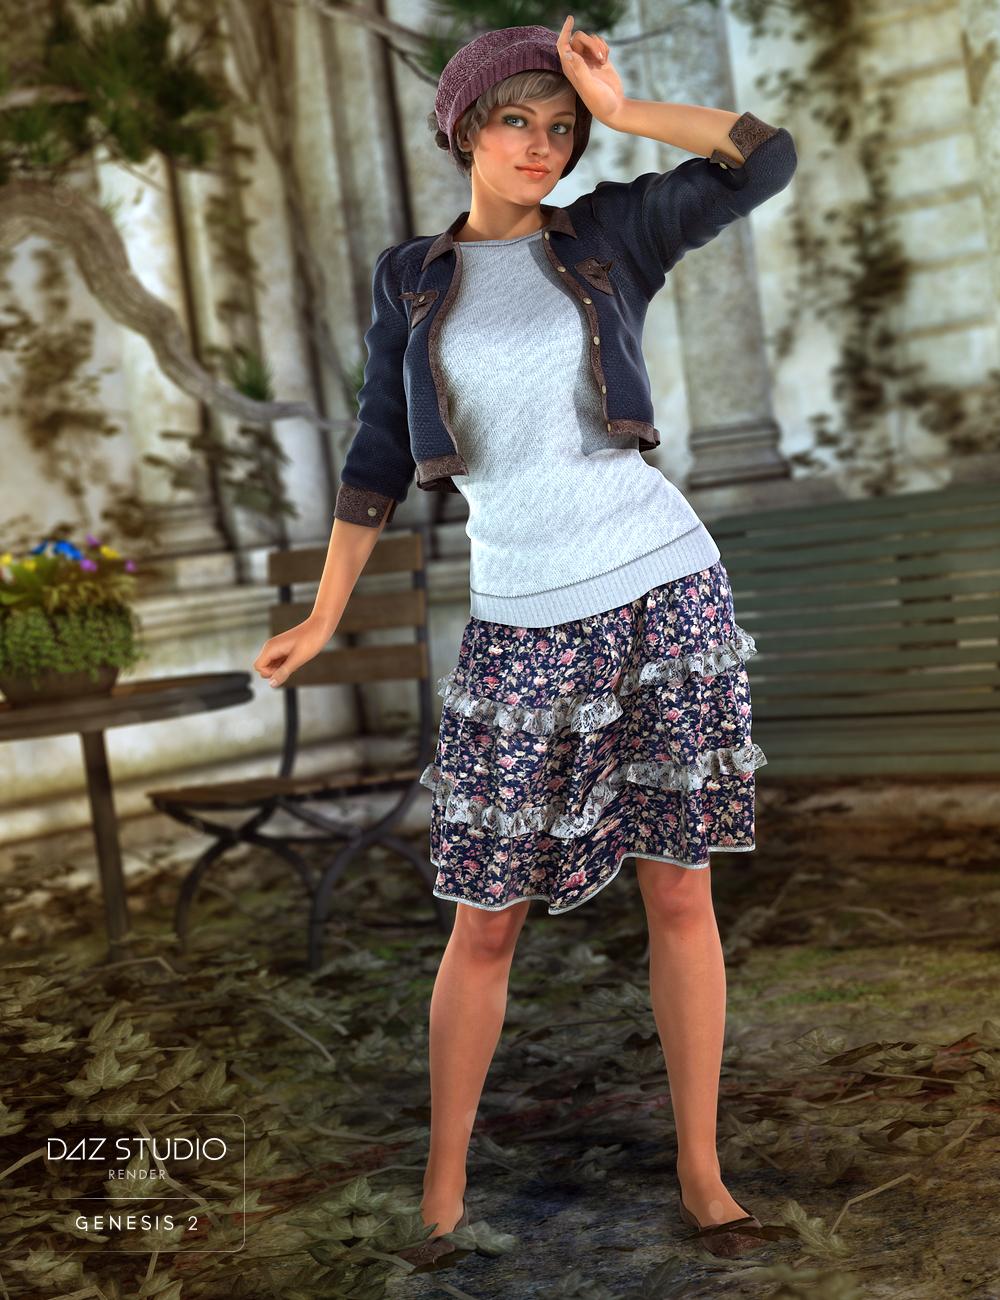 Smells Like Fall for Genesis 2 Female(s) by: Barbara BrundonSarsa, 3D Models by Daz 3D